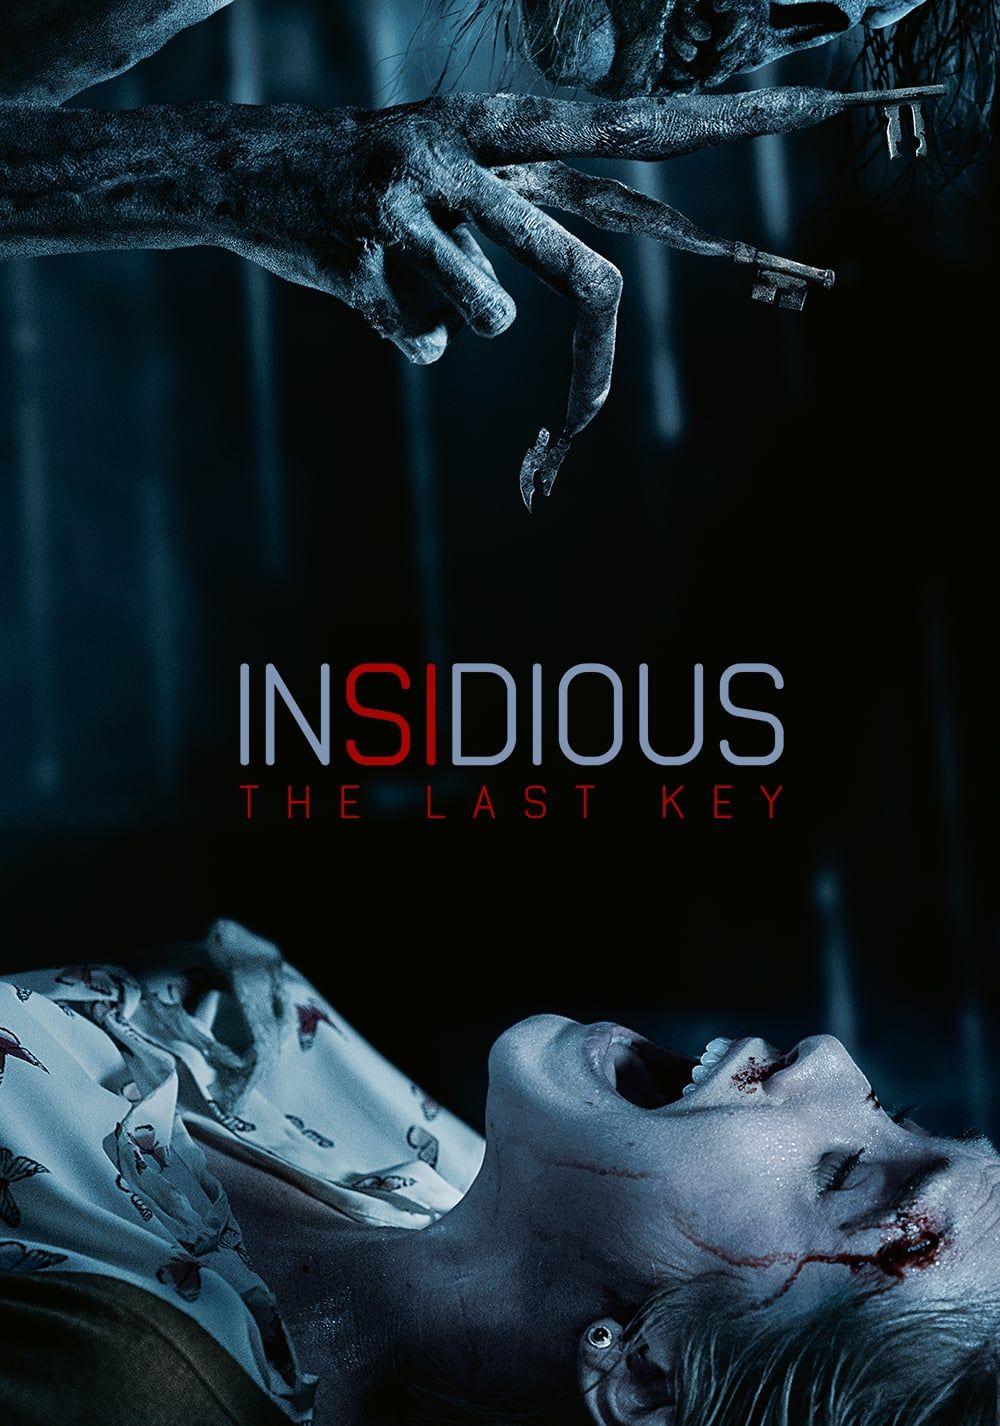 insidious free streaming full movie